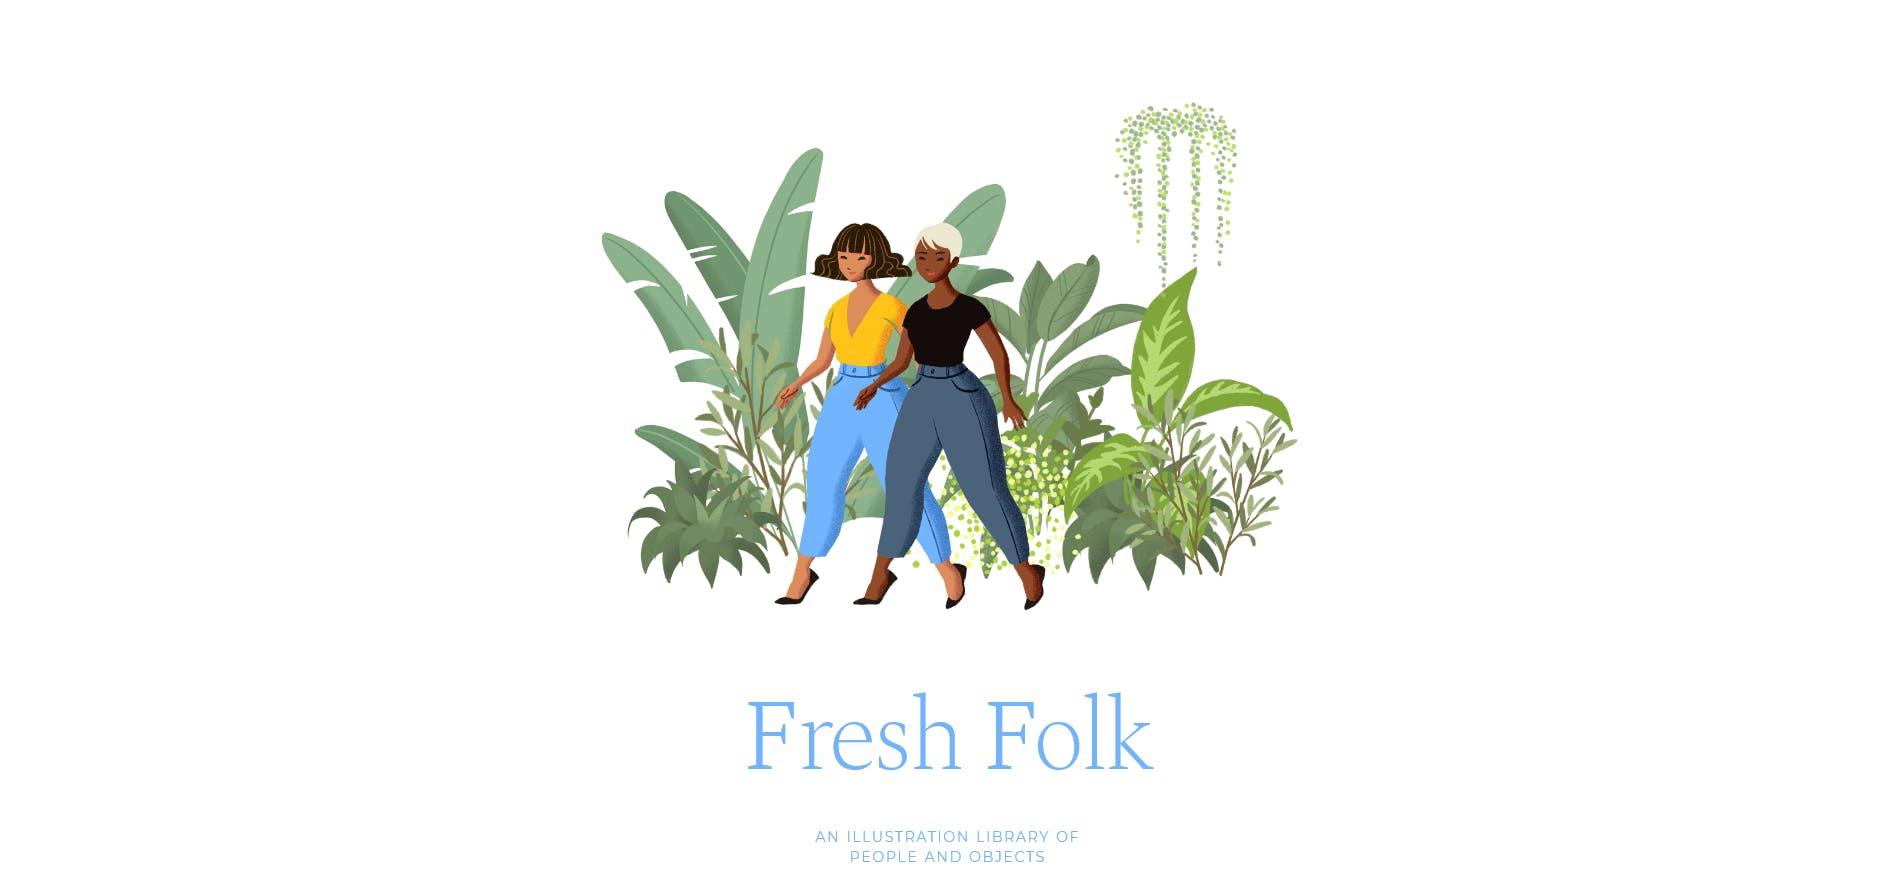 Screenshot 2021-04-30 at 07-59-26 Fresh Folk.png